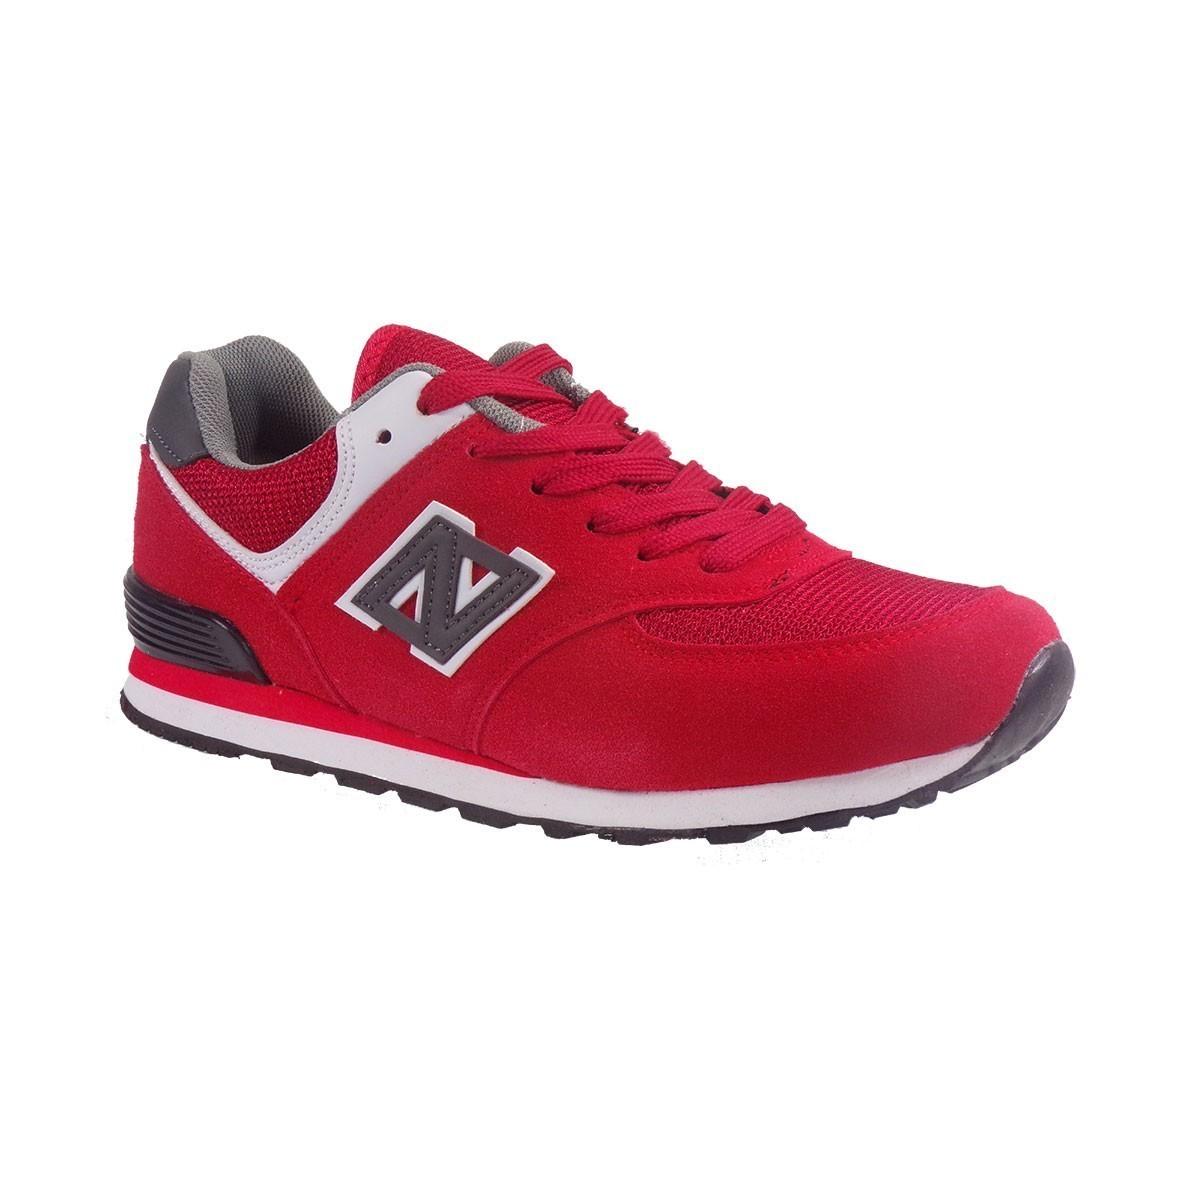 Bagiota Shoes Γυναικεία Παπούτσια Sneakers Αθλητικά L-574-4 Κόκκινο